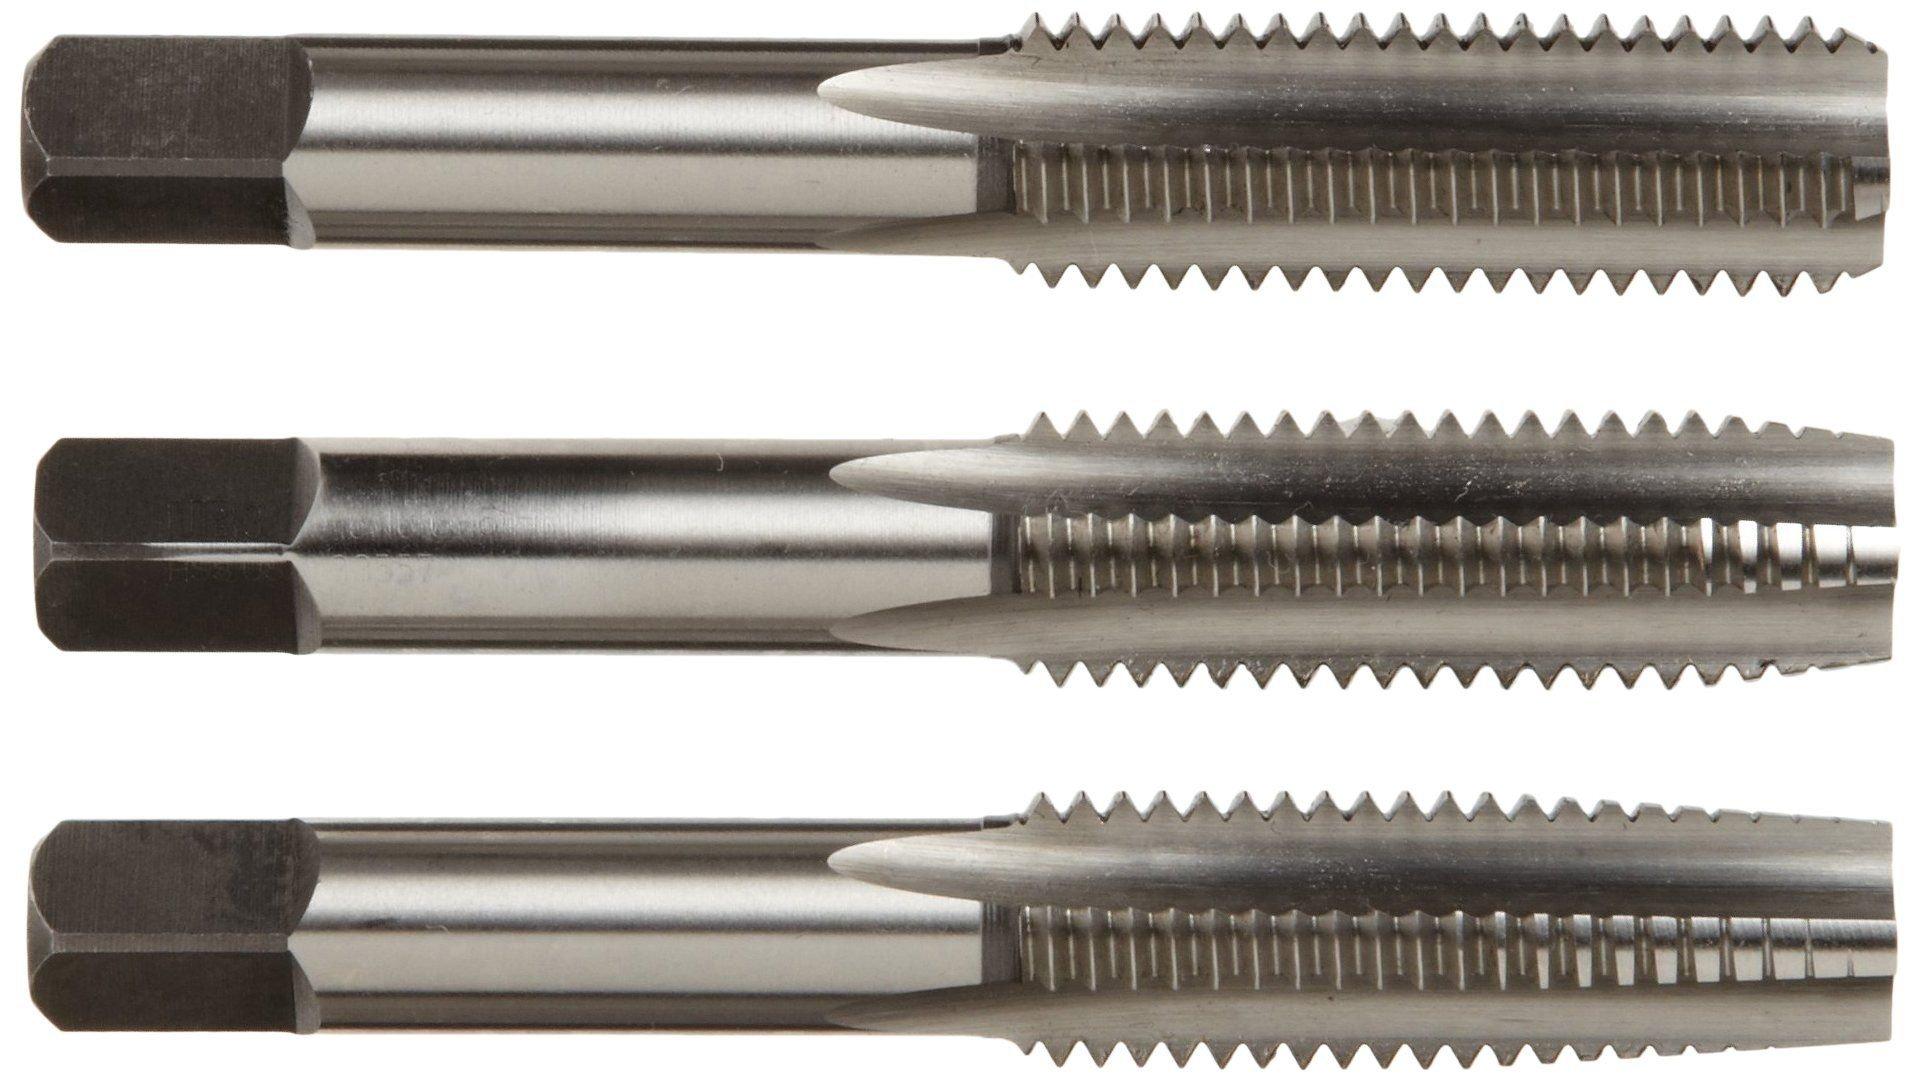 Alfa Tools CSHTS70546 3/4-10 Carbon Steel Hand Tap Set Taper/Plug/Bottom by Alfa Tools